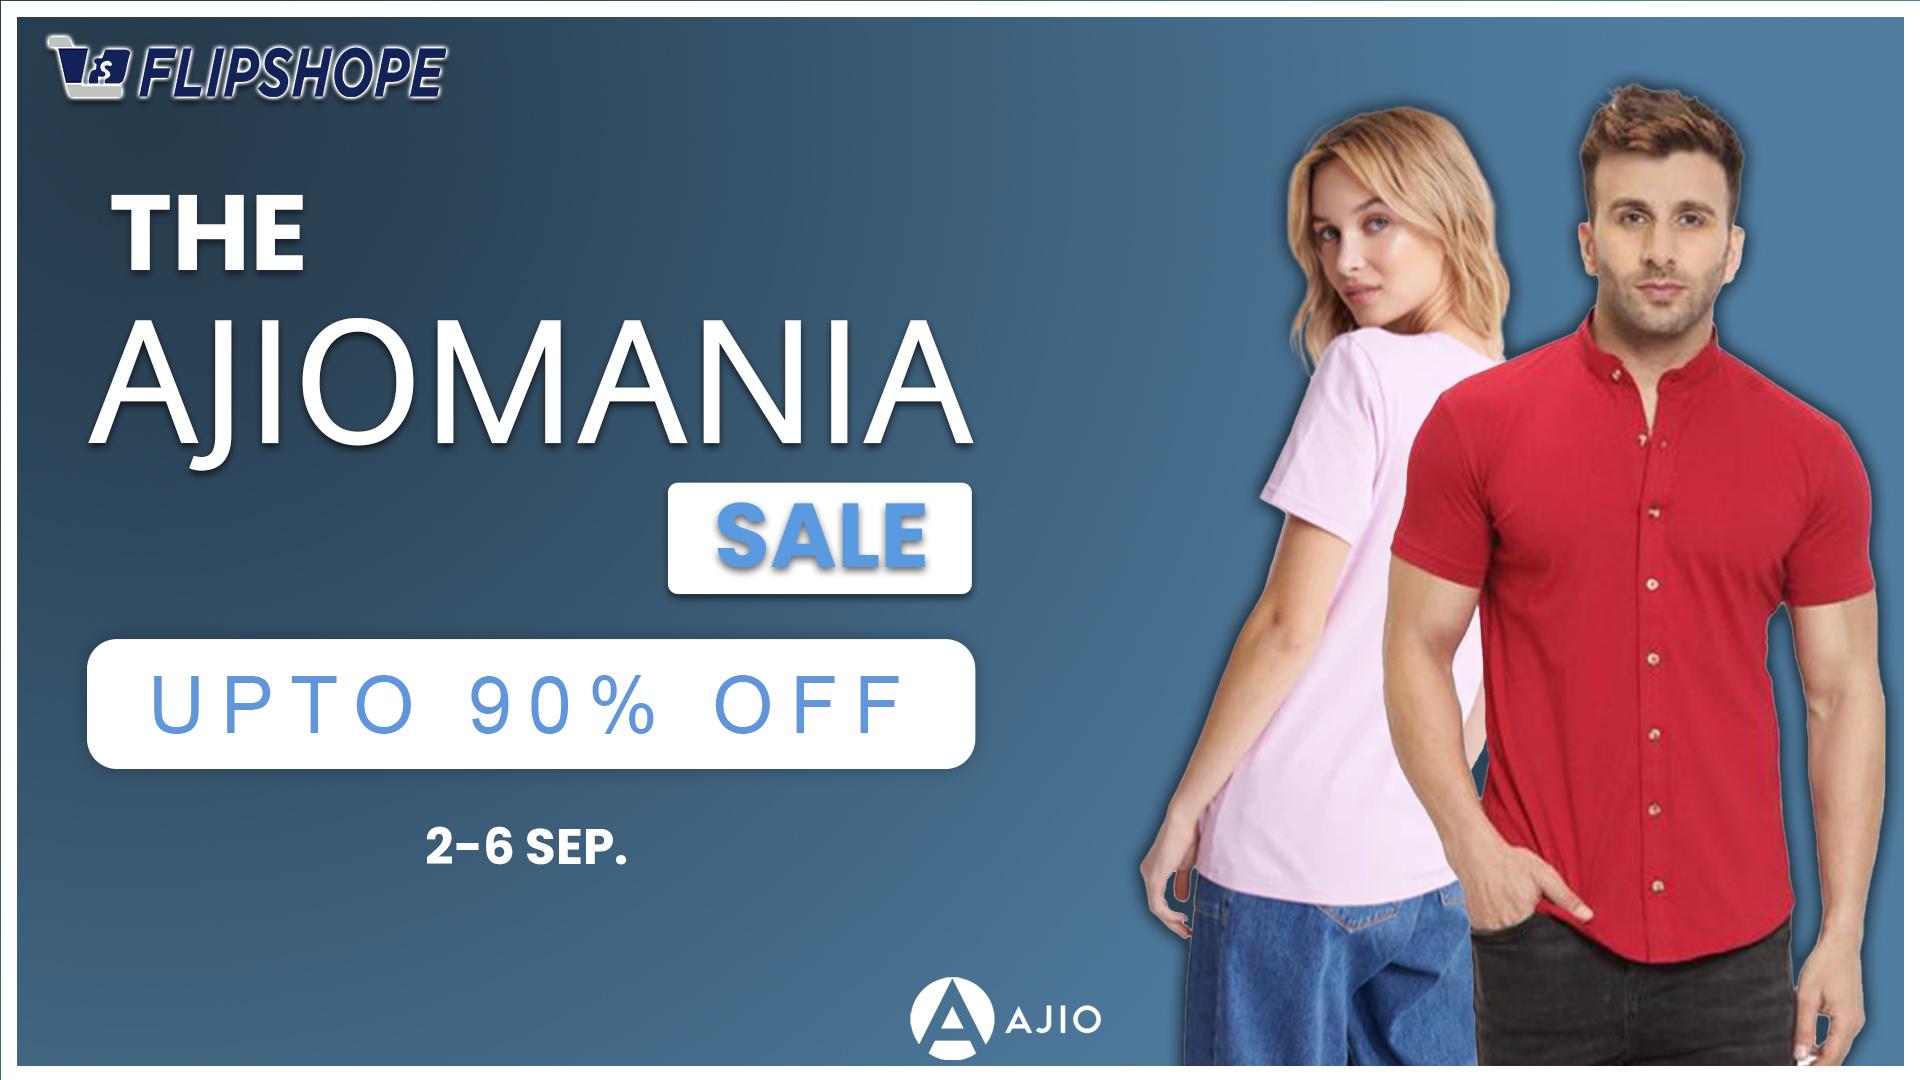 the ajiomania sale